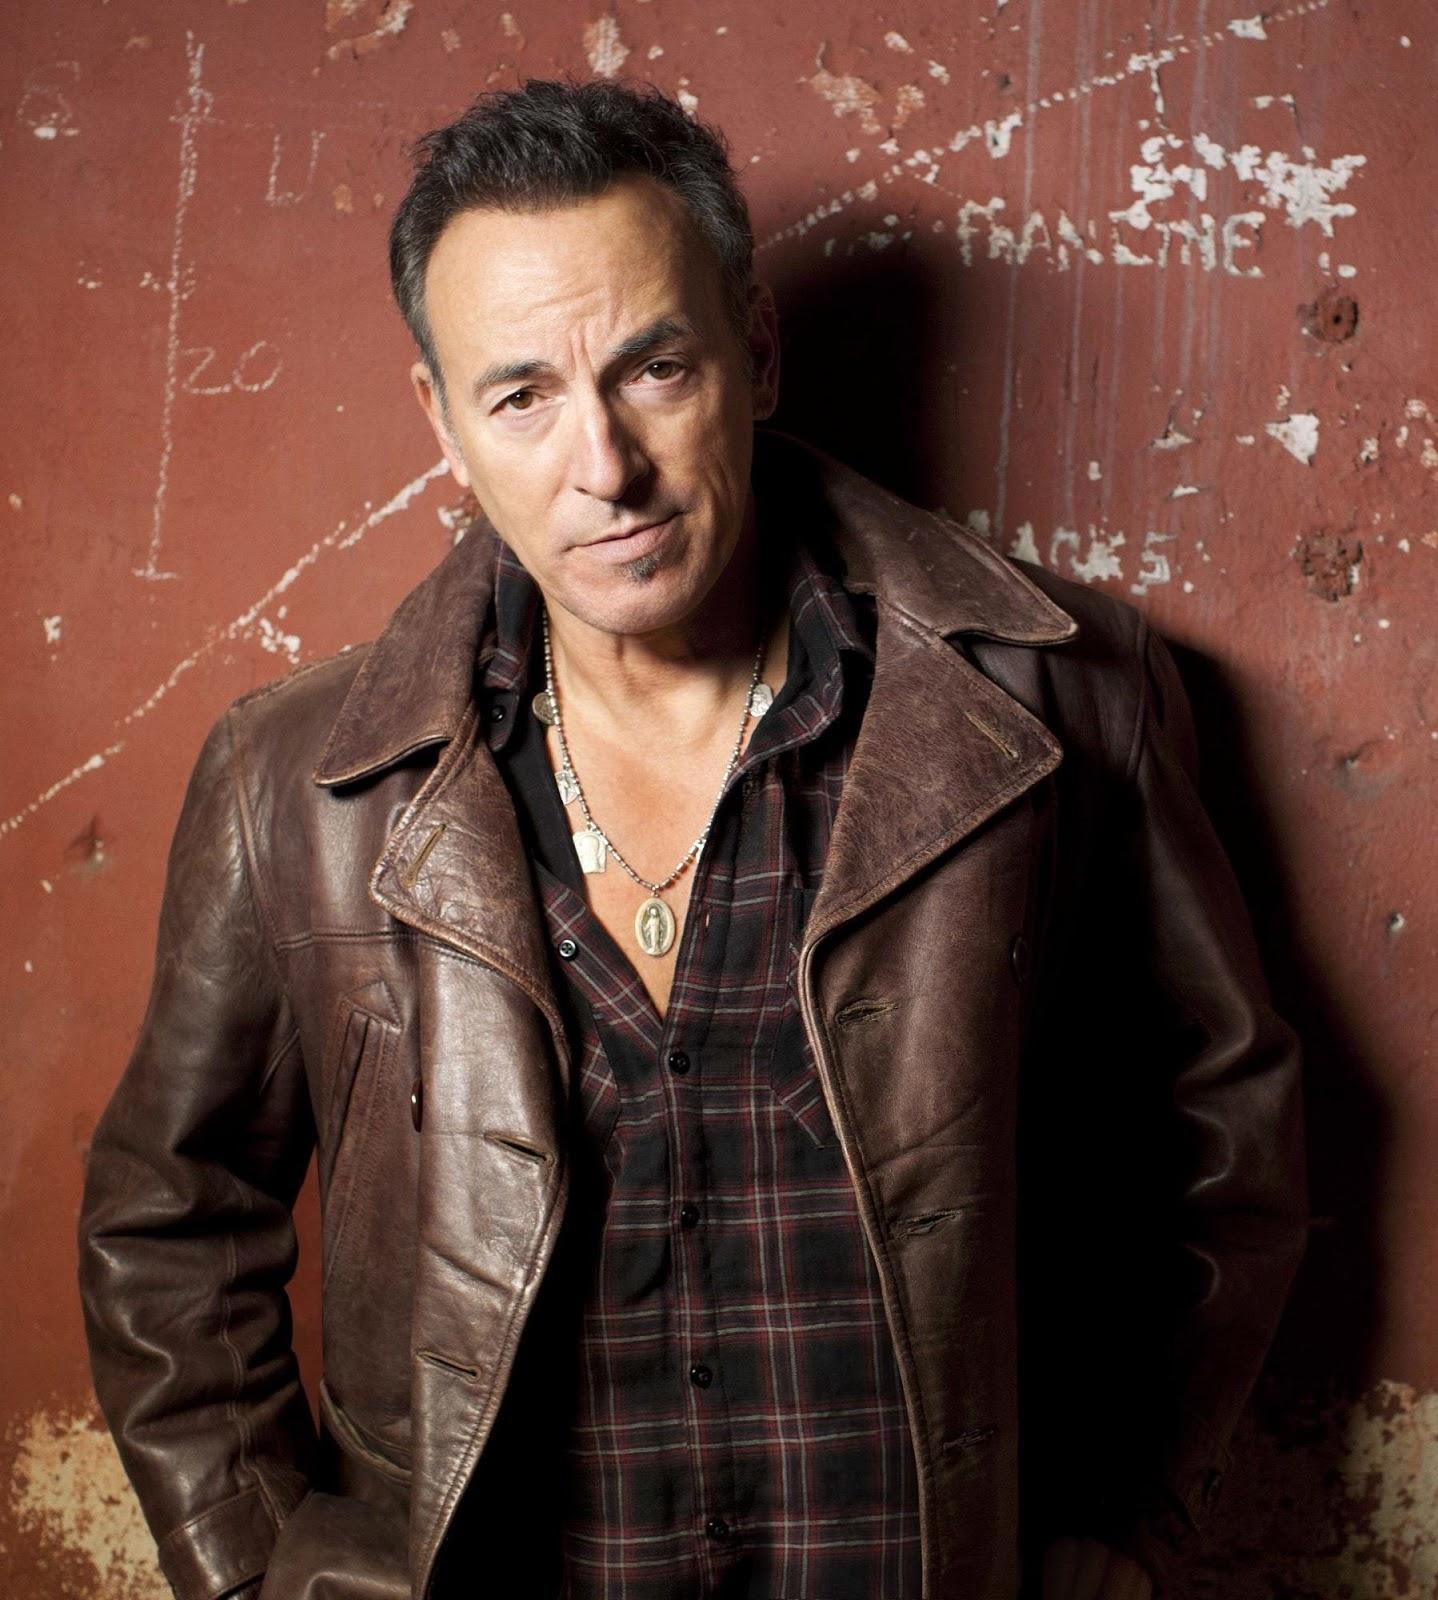 http://4.bp.blogspot.com/-QuP3Jiyck-Y/UMIbn-RGouI/AAAAAAAAC3Q/M42QbwEDCvA/s1600/Bruce+Springsteen+2012.jpg